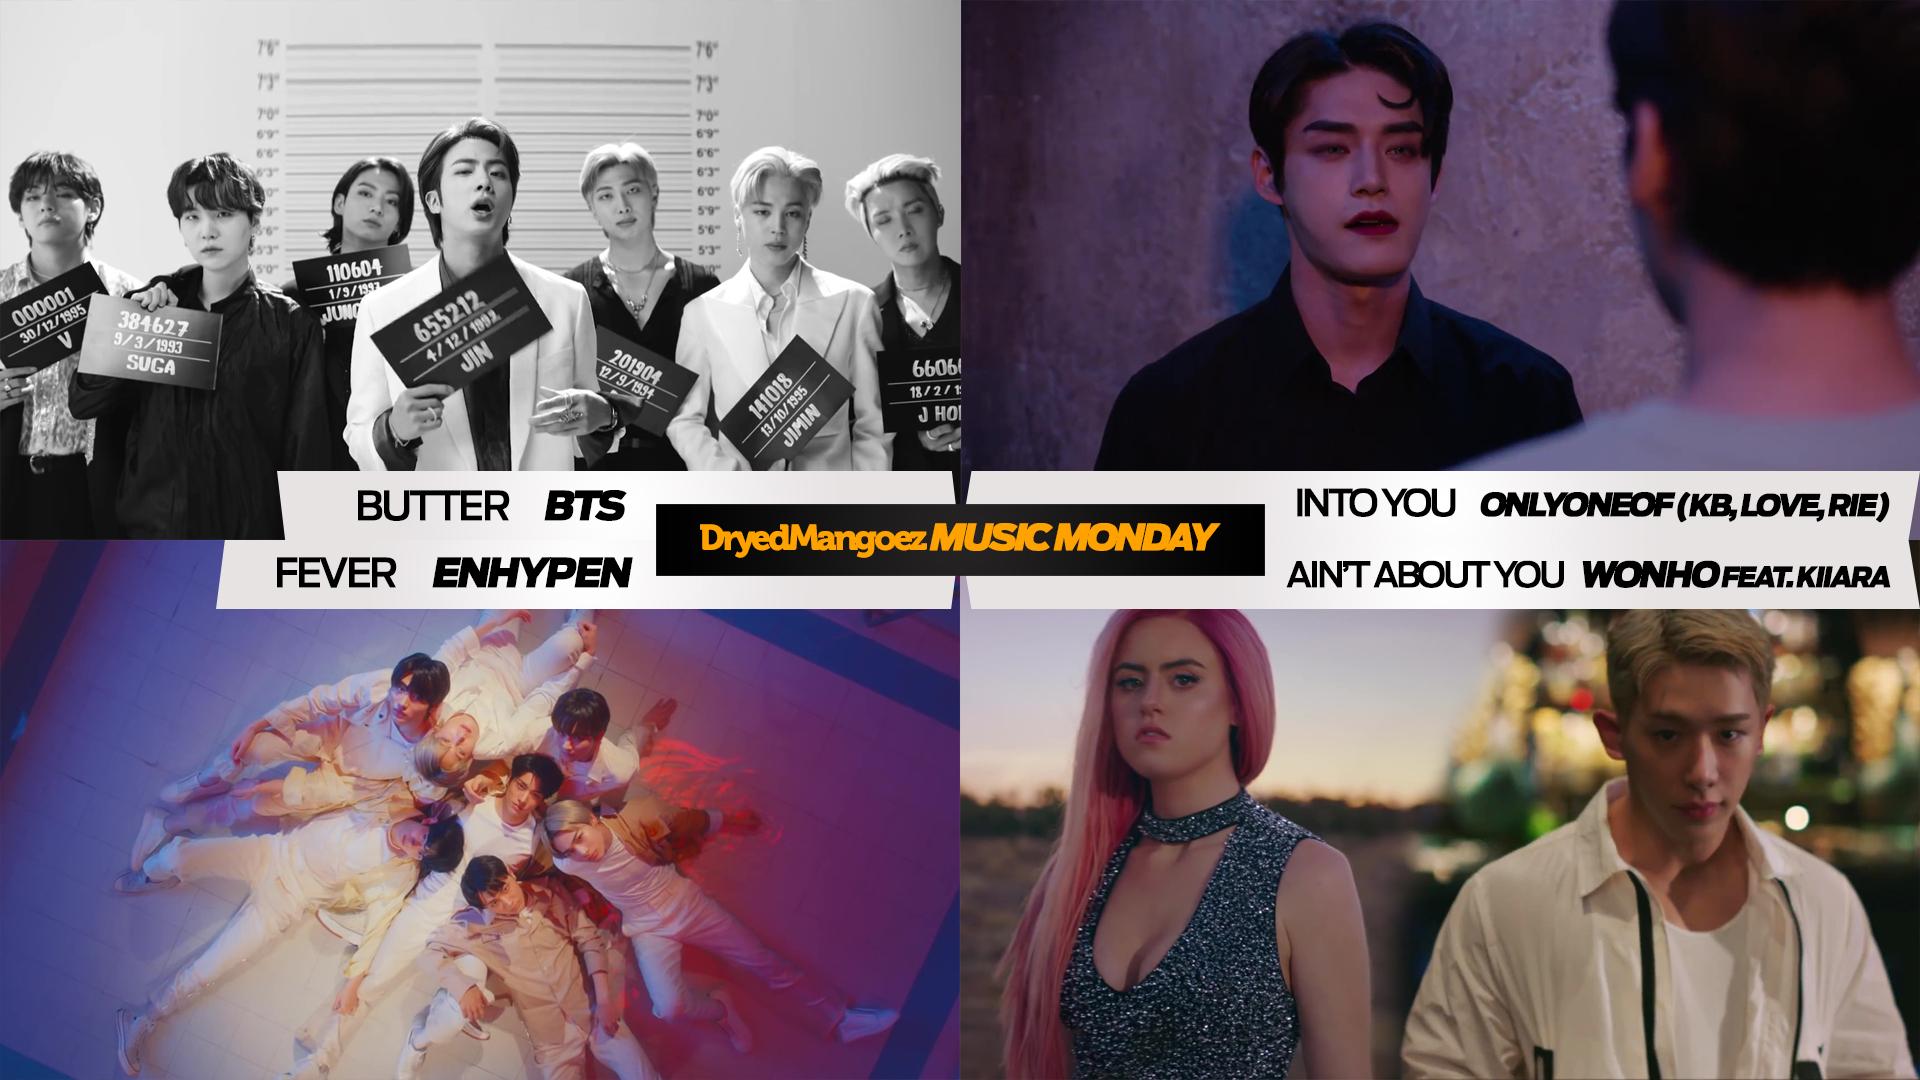 Music Monday, May 24, 2021 (Part 2) – BTS, OnlyOneOf, ENHYPEN, Wonho featuring Kiiara